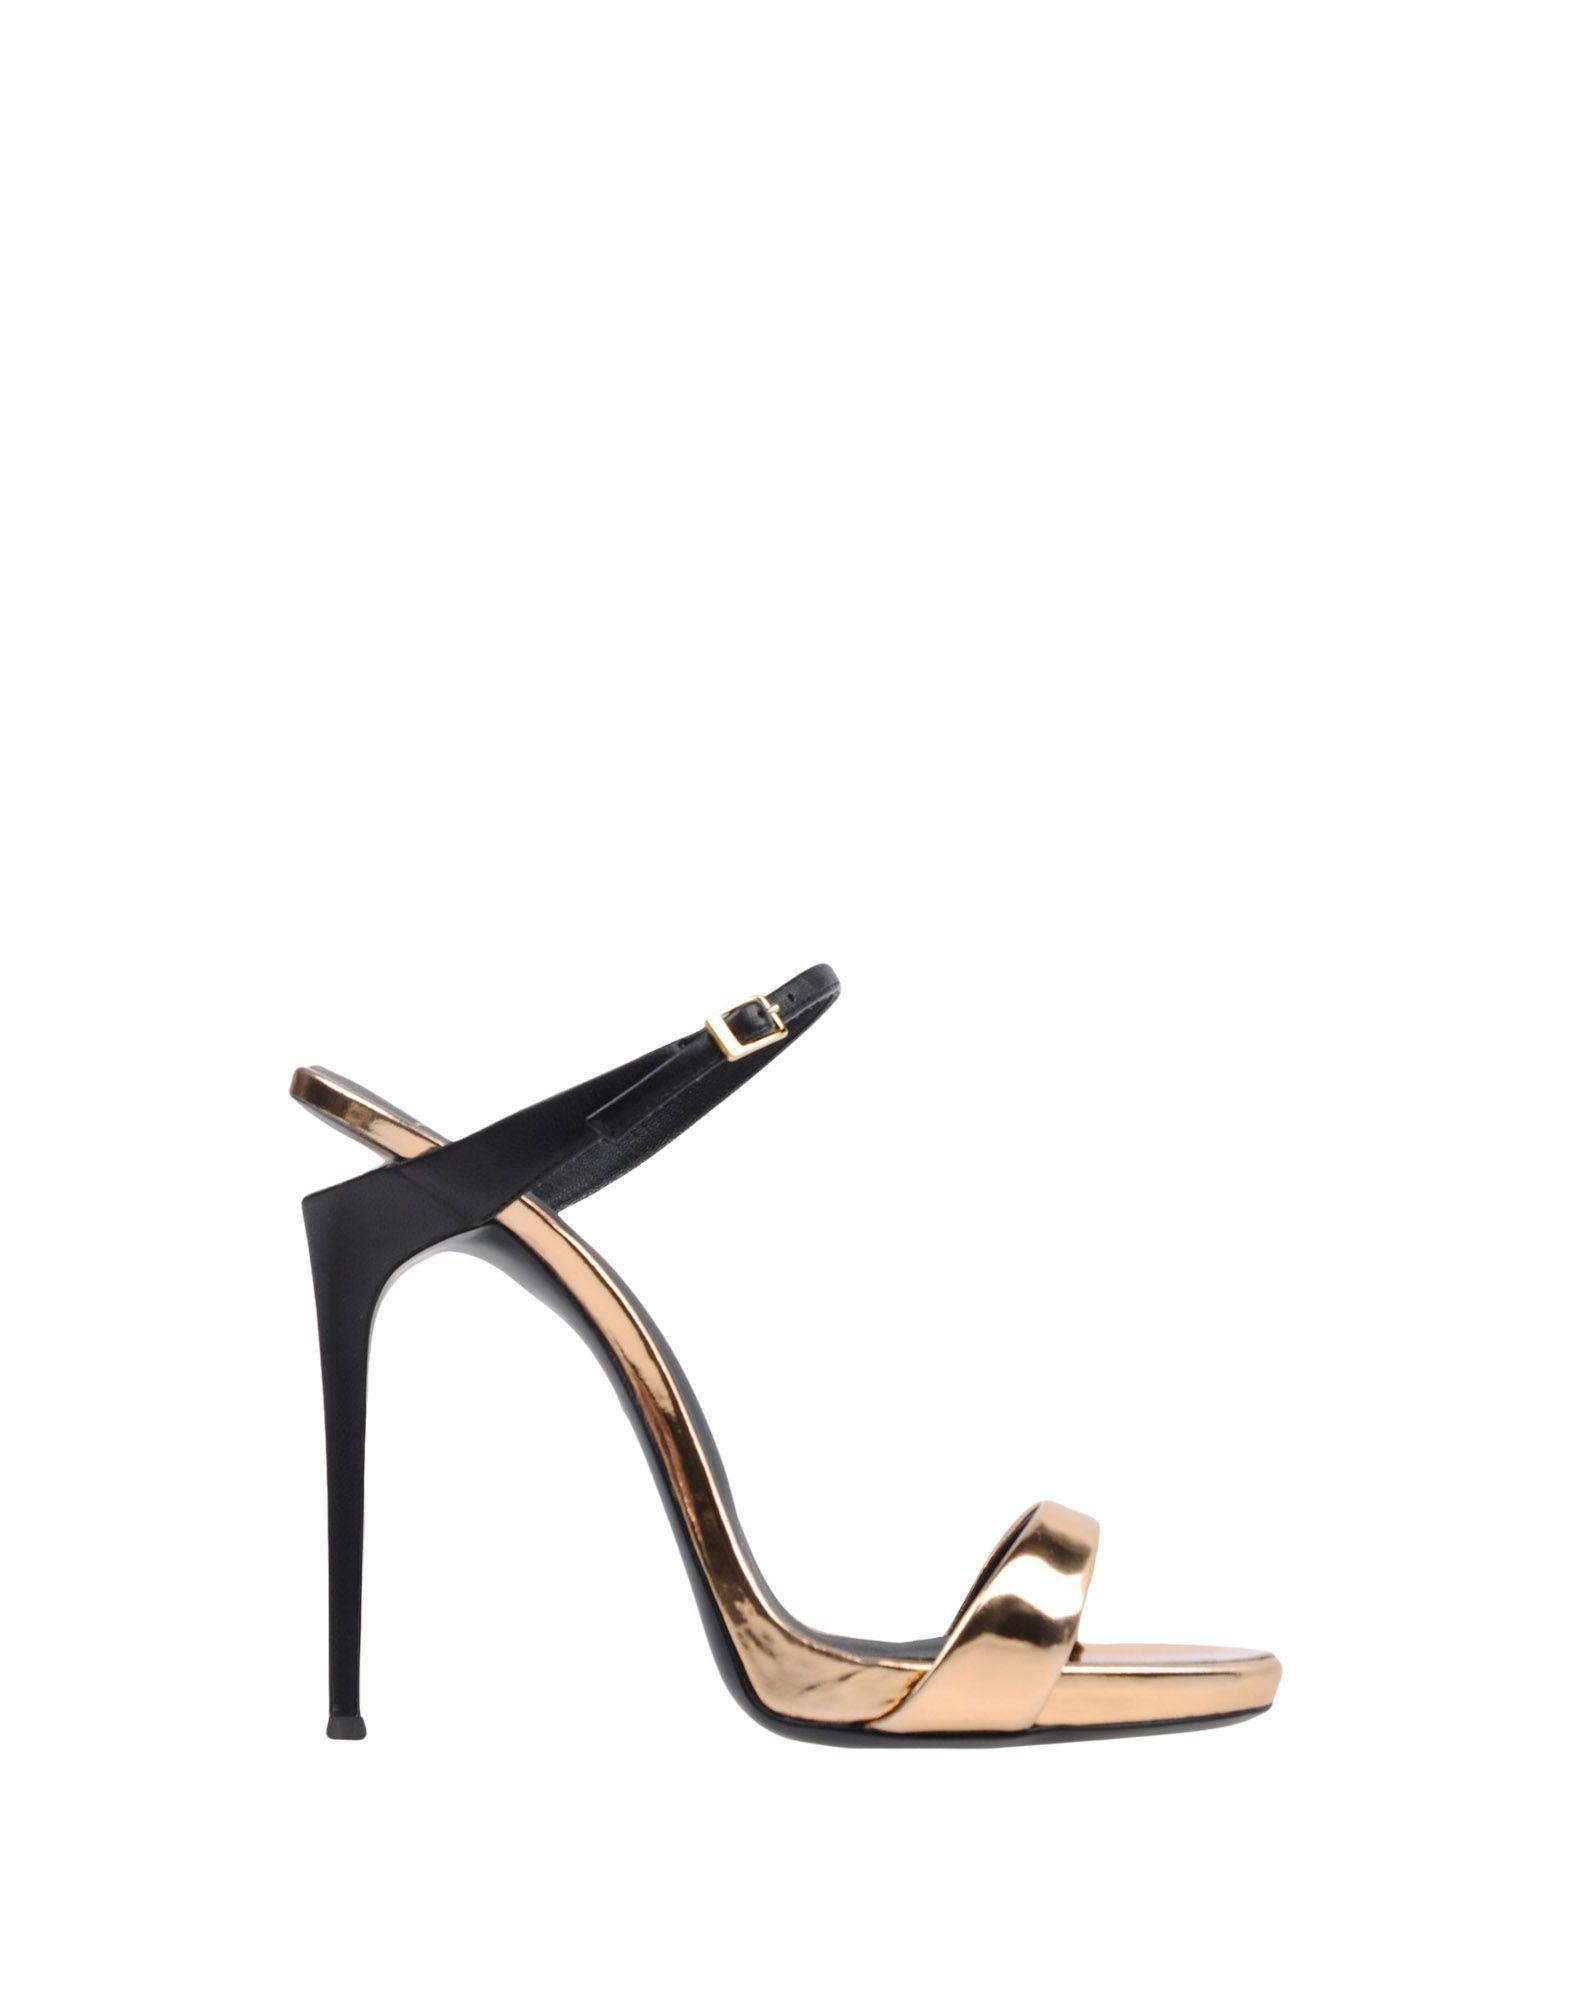 Giuseppe Zanotti Sandalen aussehende Damen  11357593XBGünstige gut aussehende Sandalen Schuhe ba25d1